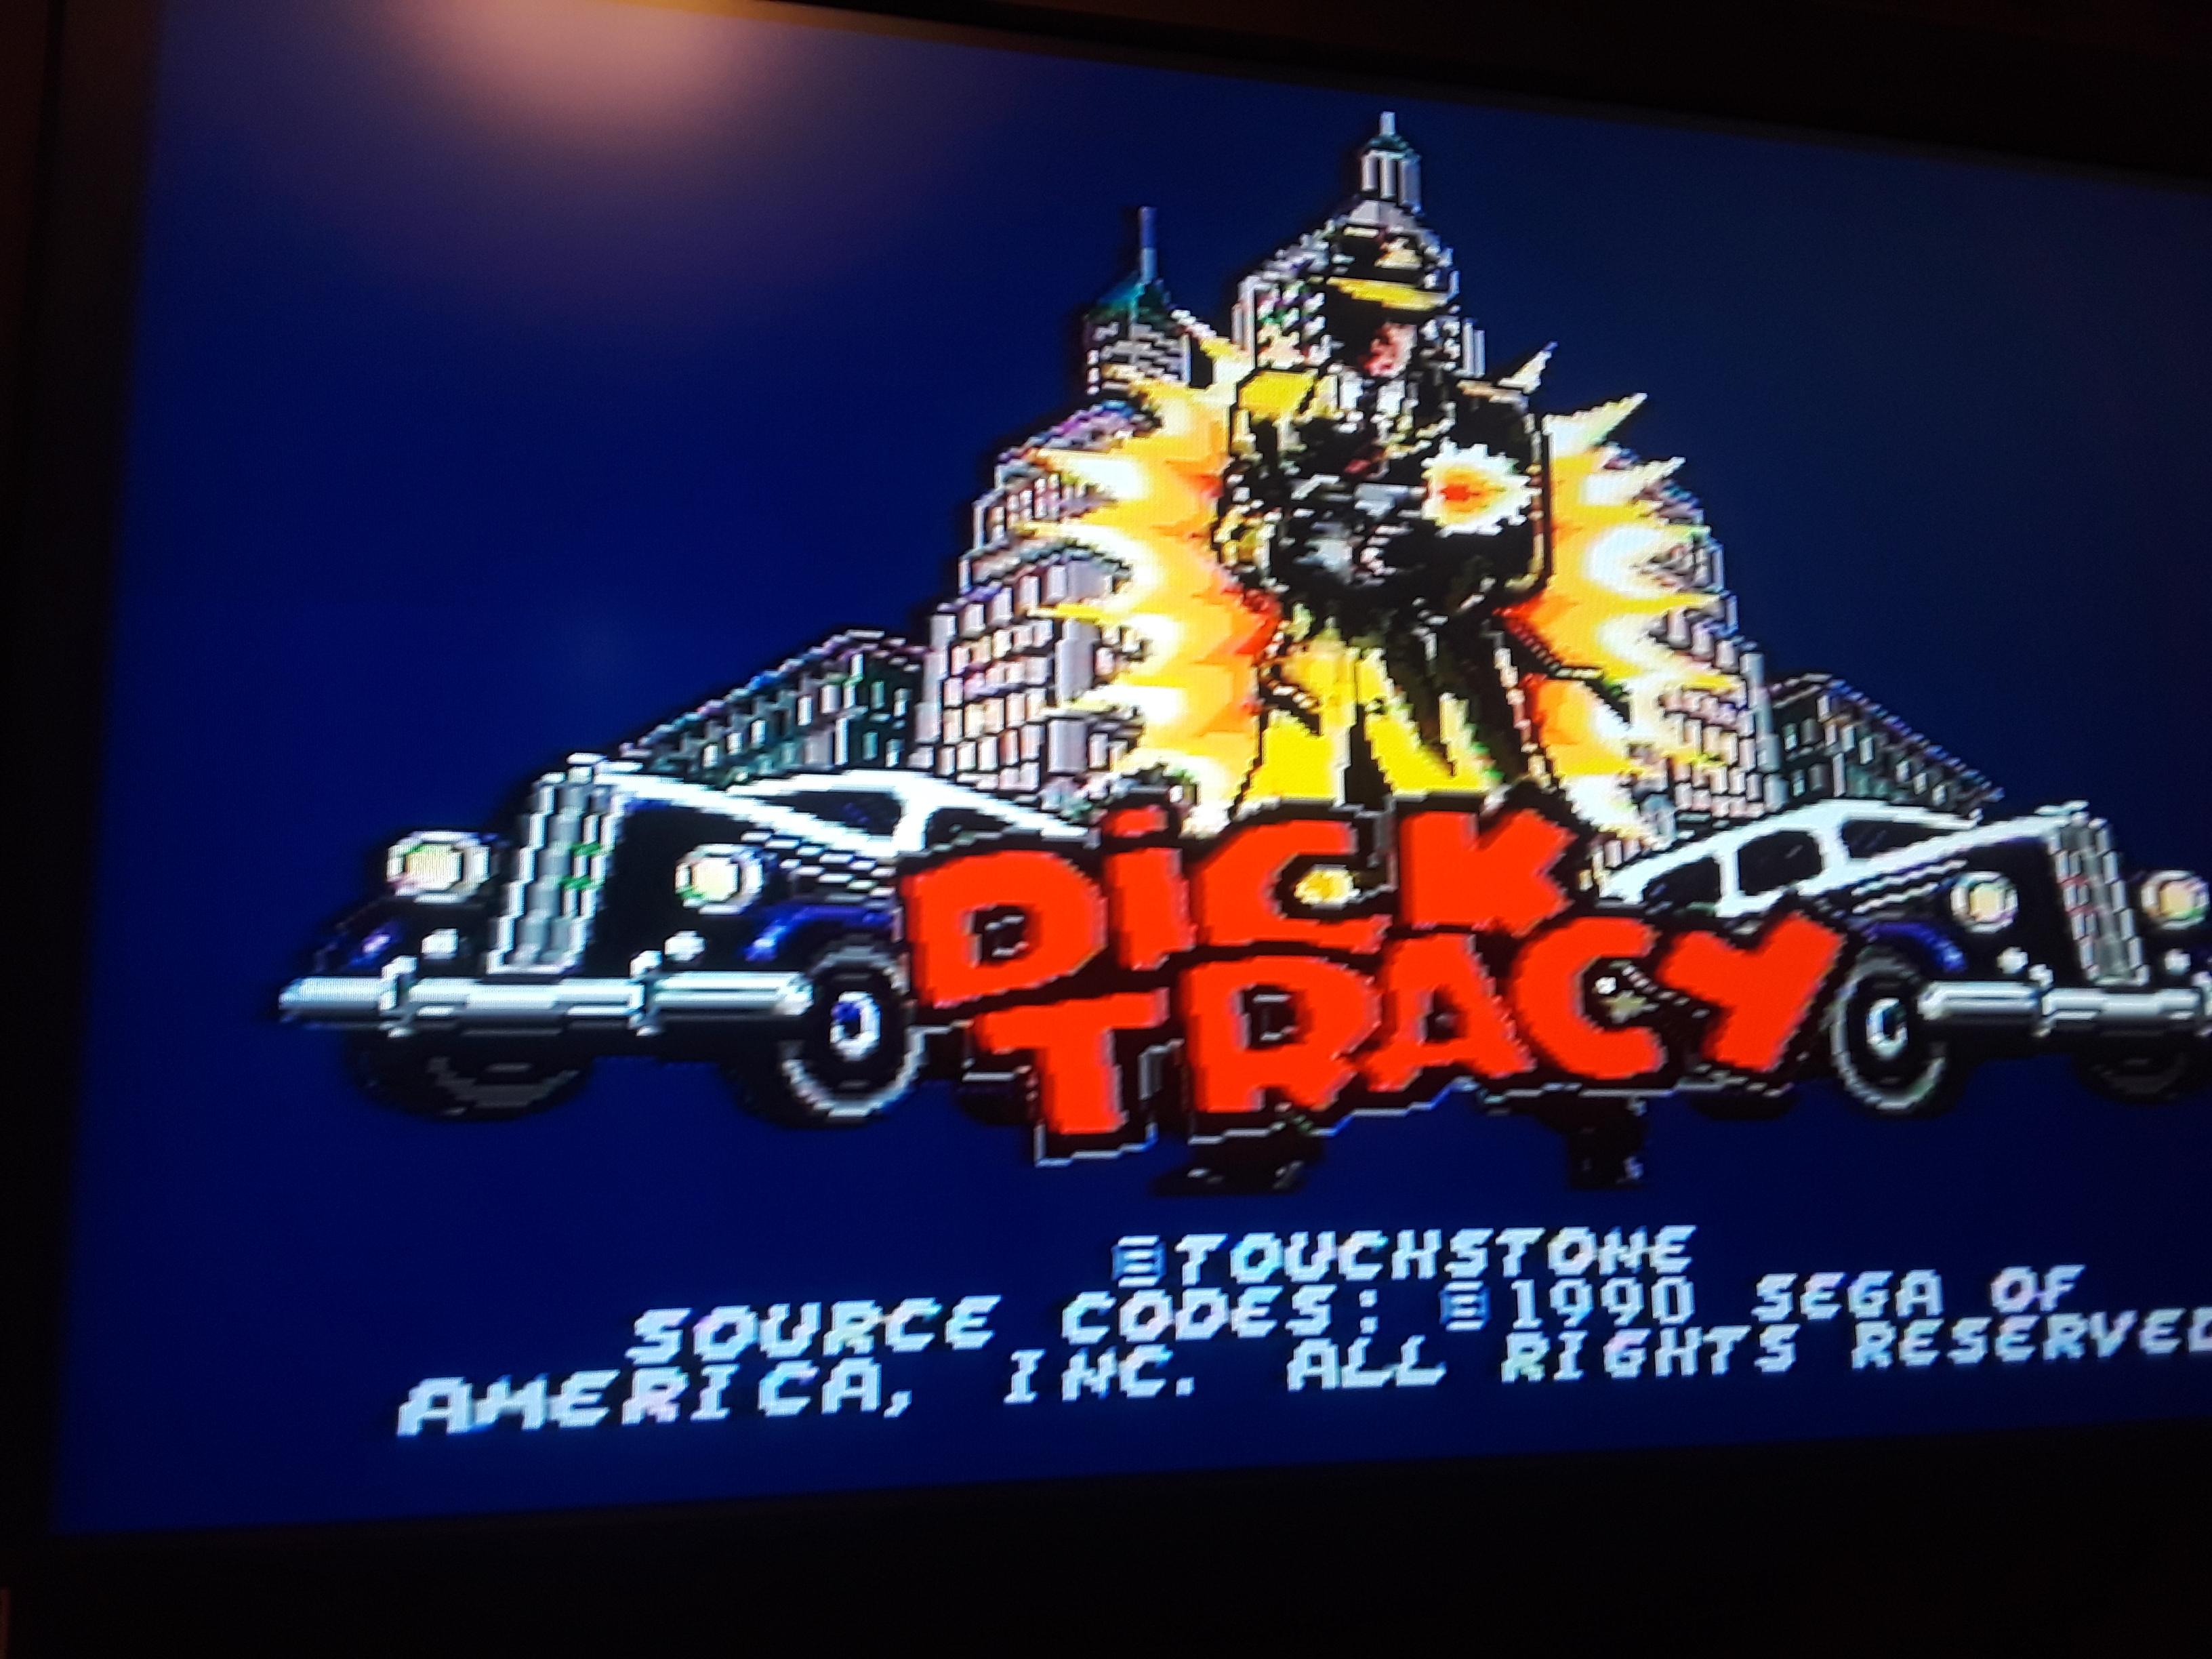 JML101582: Dick Tracy [Normal] (Sega Genesis / MegaDrive Emulated) 21,400 points on 2018-08-04 00:01:59